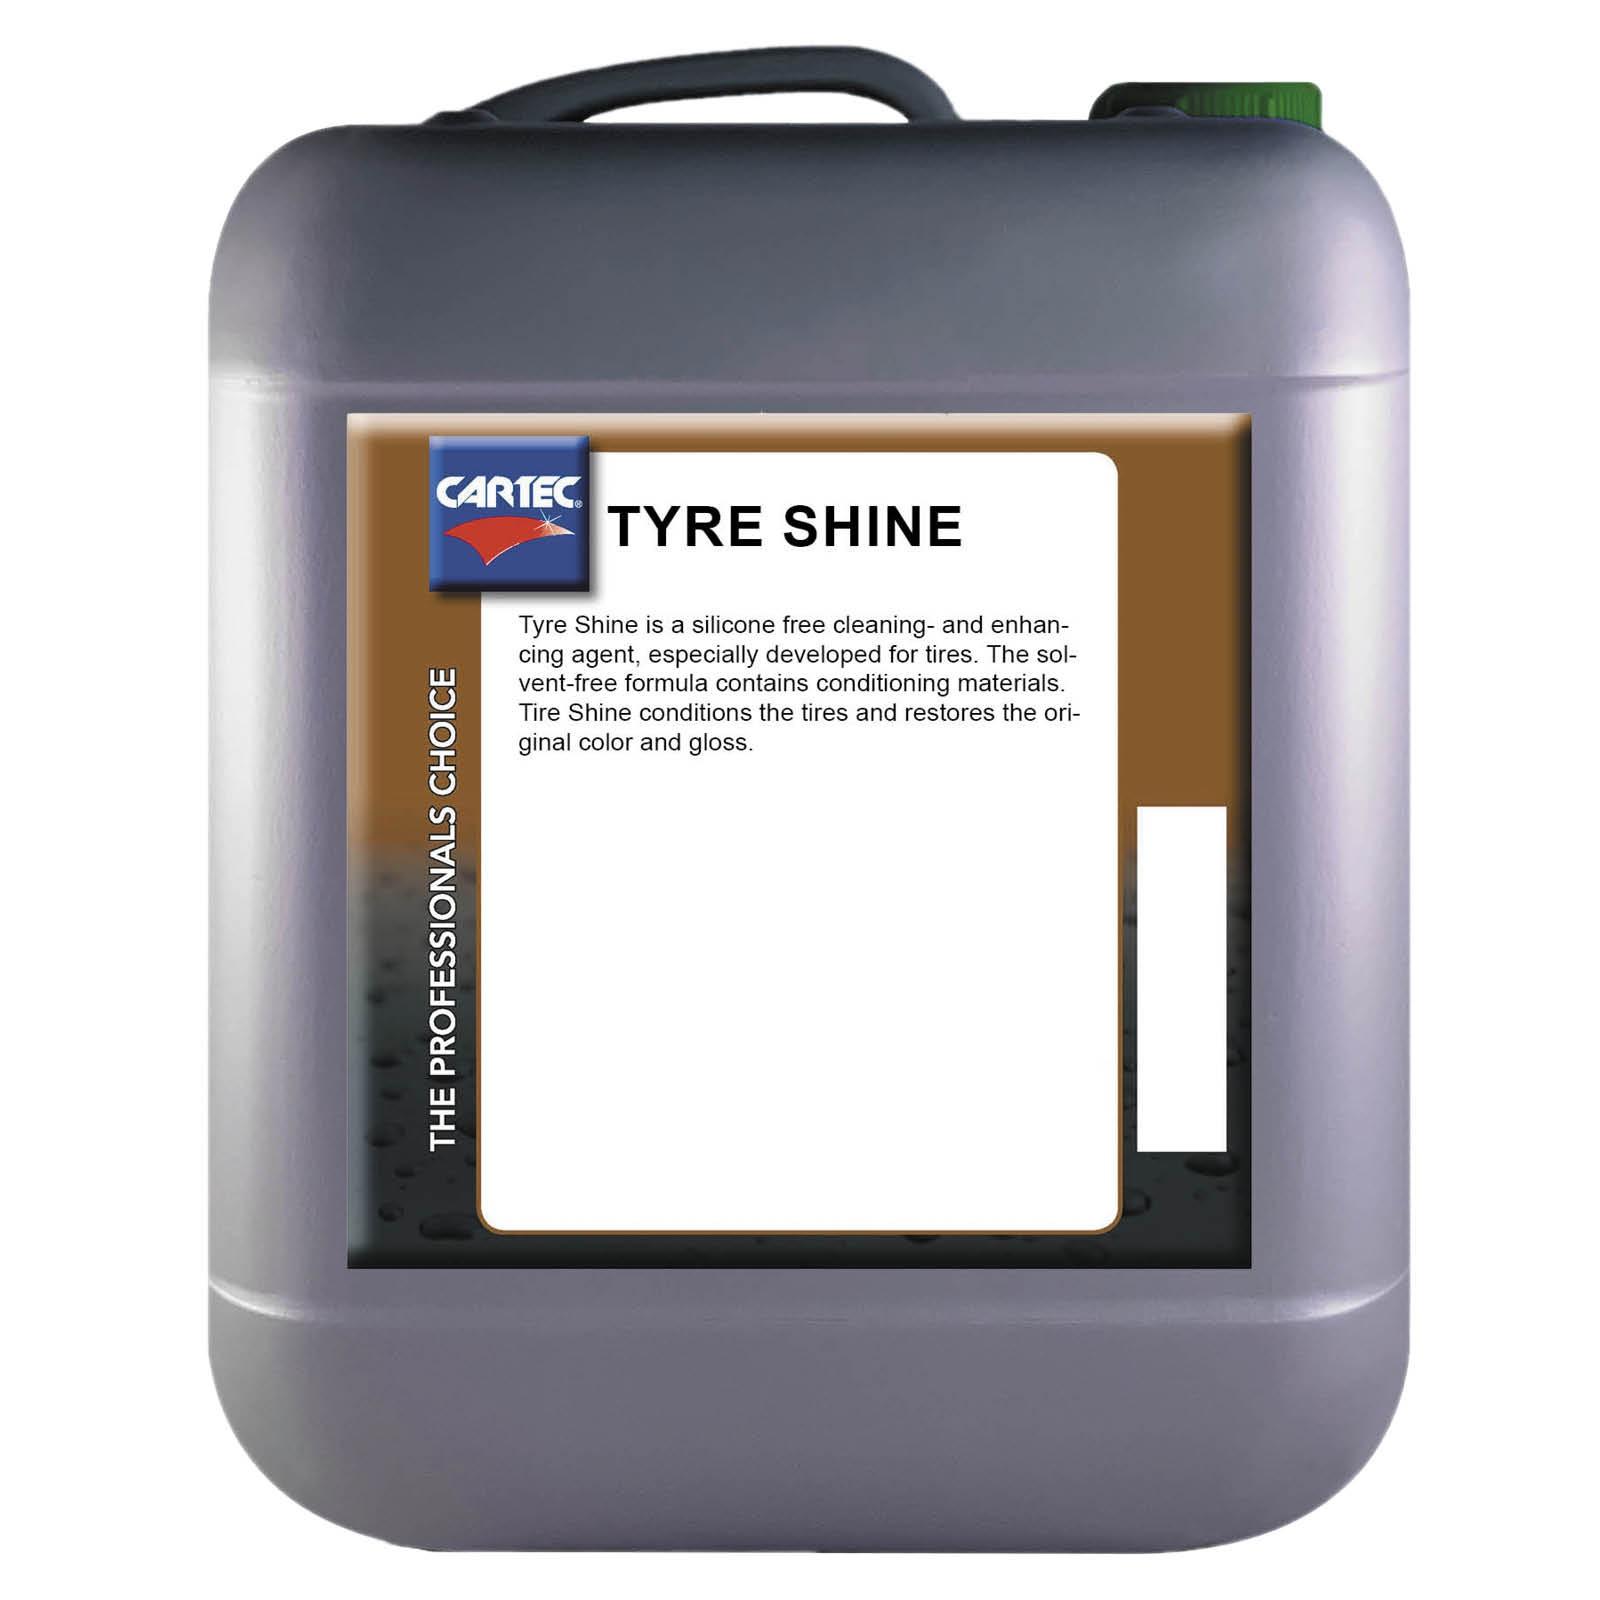 Tyre Shine